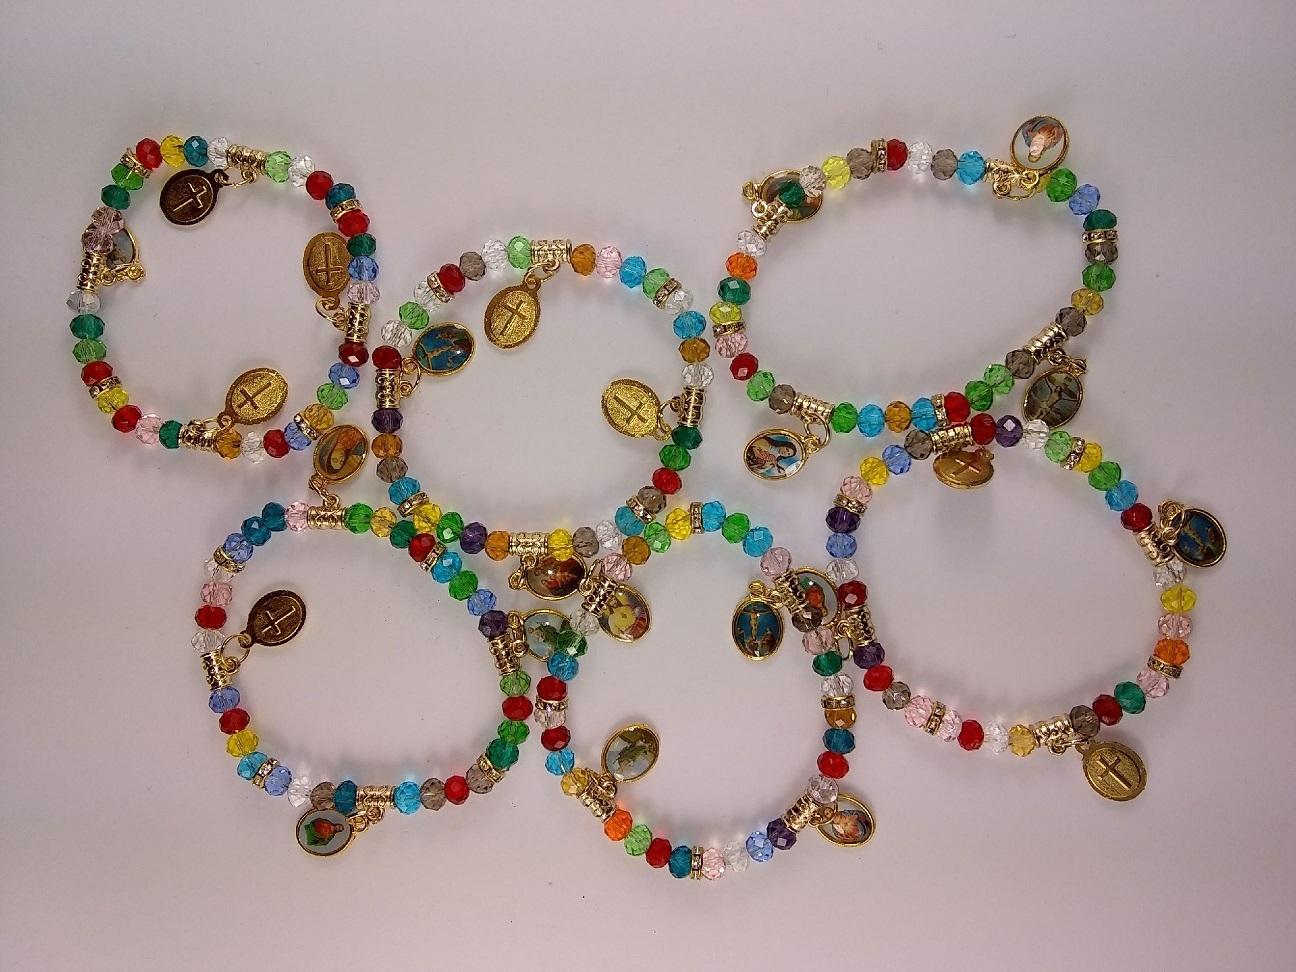 Fashion - Jewelry - Religious Charm BRACELET SA-1226 SOLD BY THE DOZEN